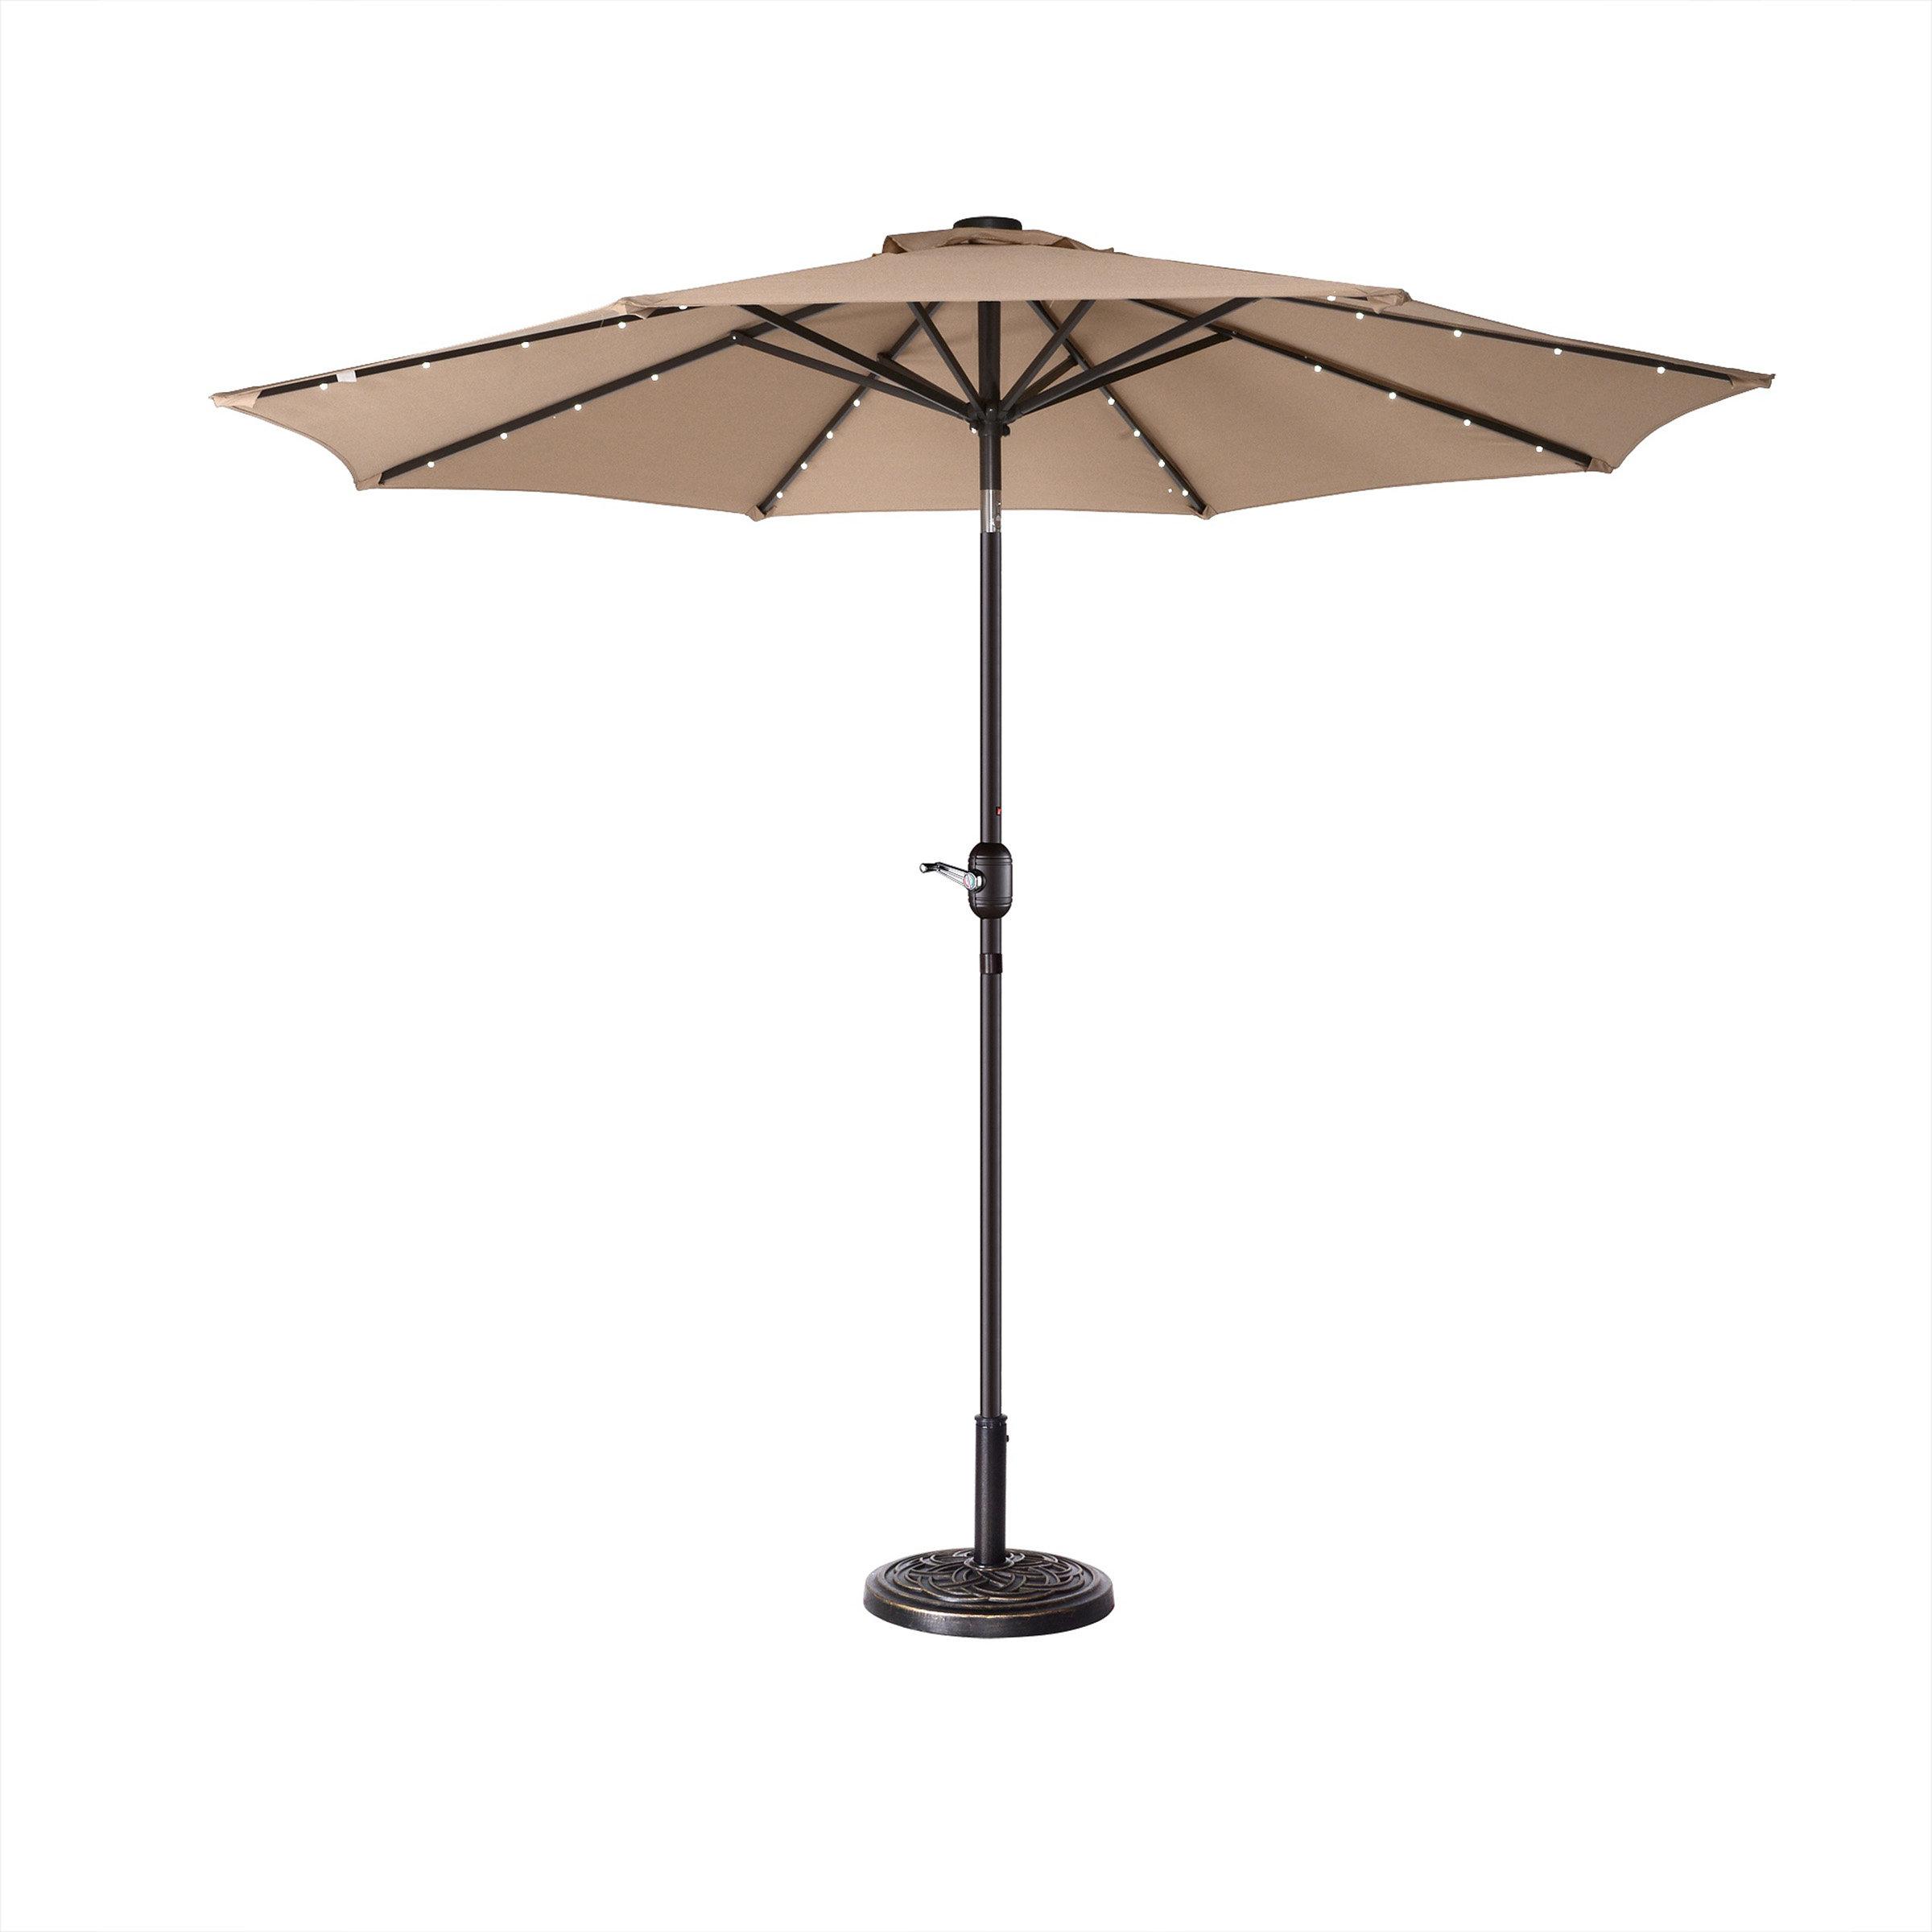 Popular Hawkinge Market Umbrellas Intended For Coggeshall Led Lighted 9' Market Umbrella (View 7 of 20)